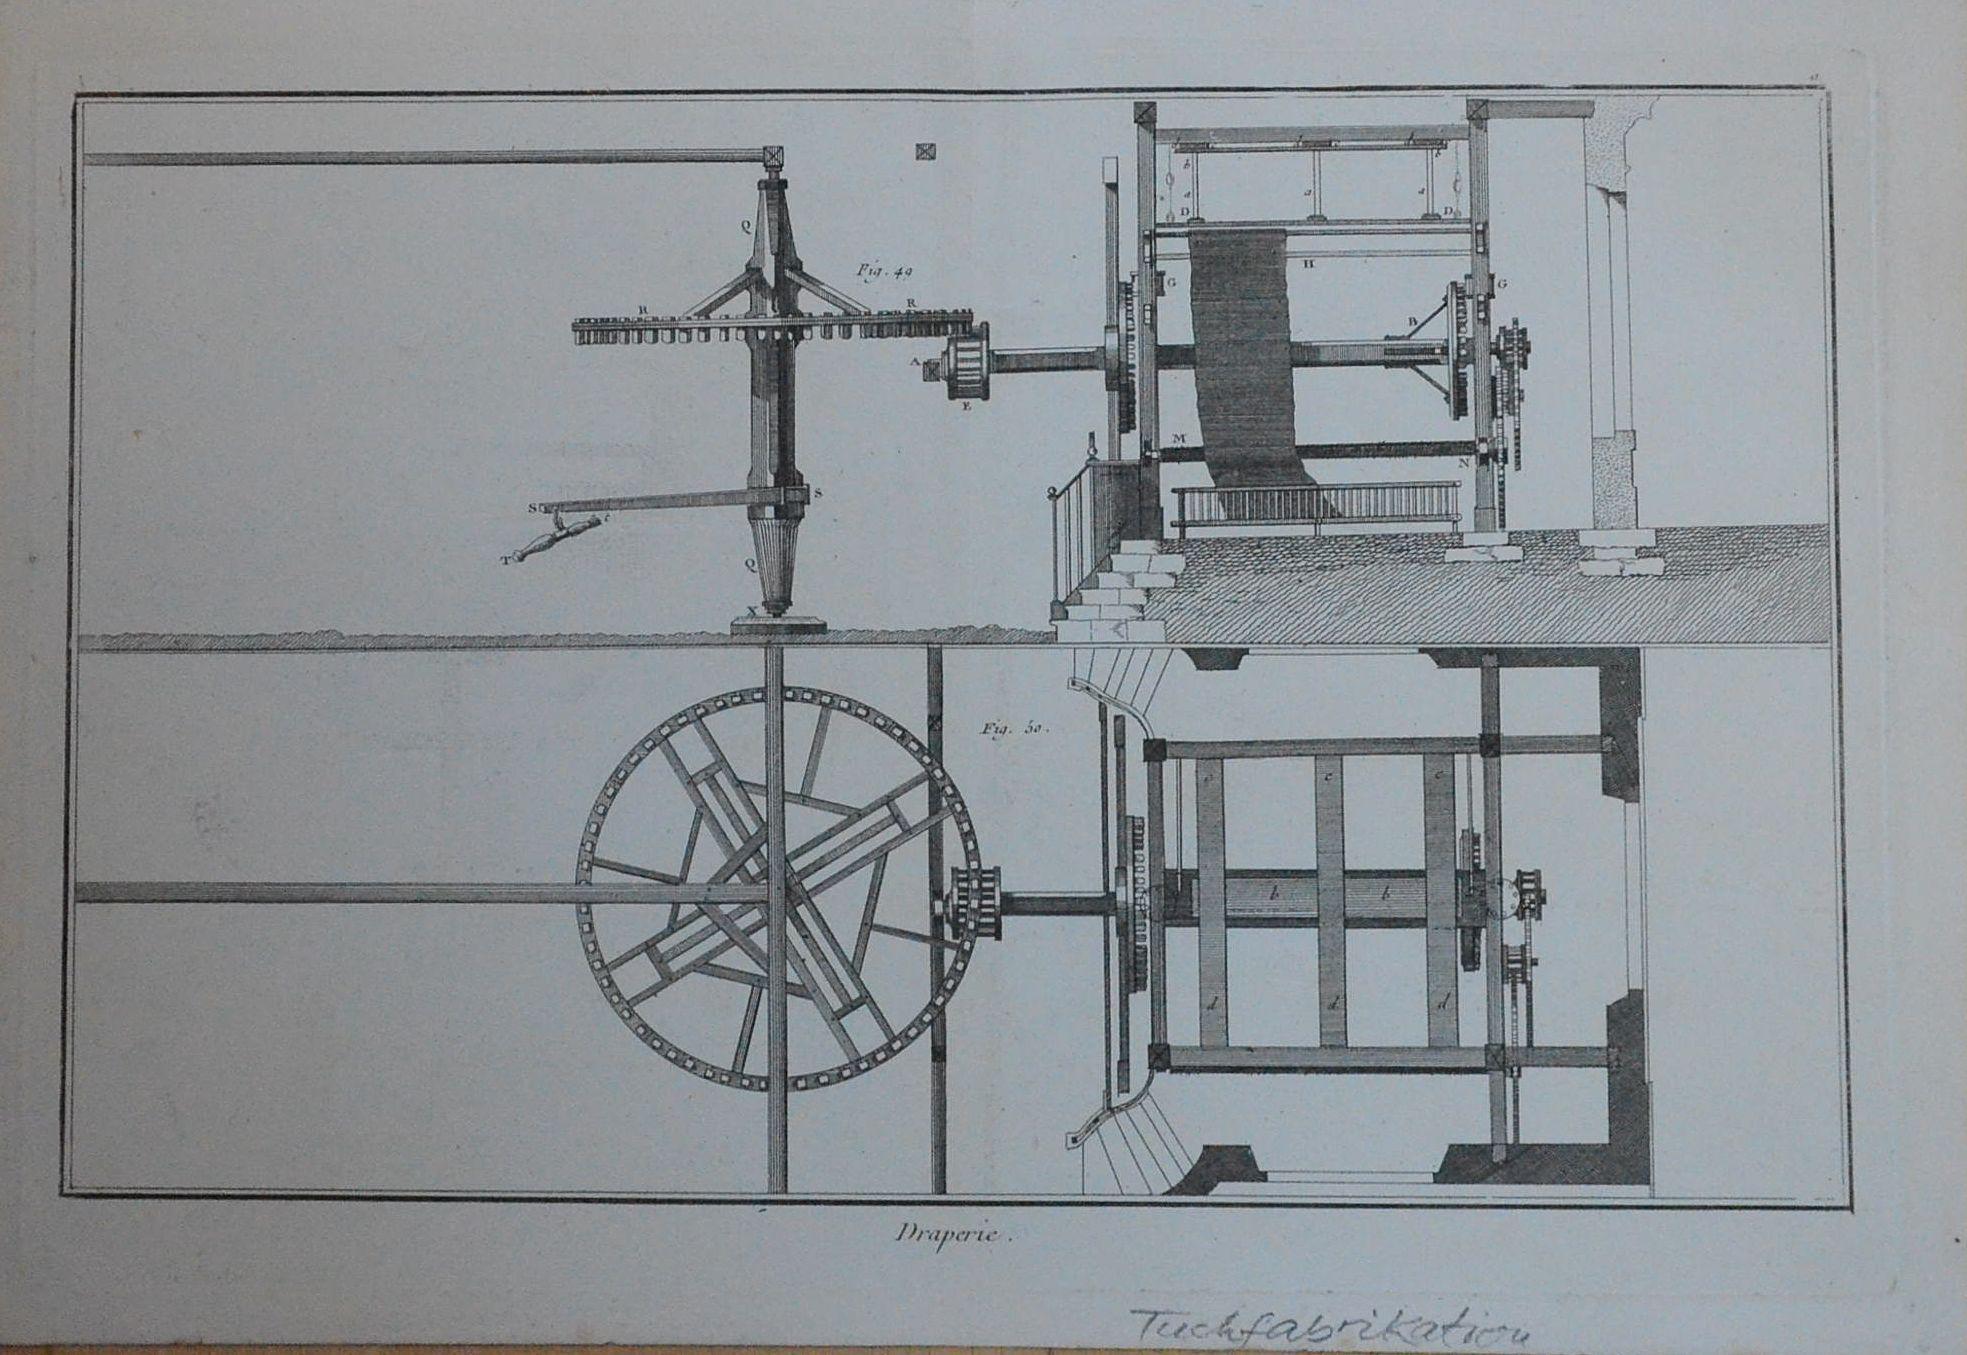 Draperie. Tuchfabrikation. Blatt 9.: Kupferstich.